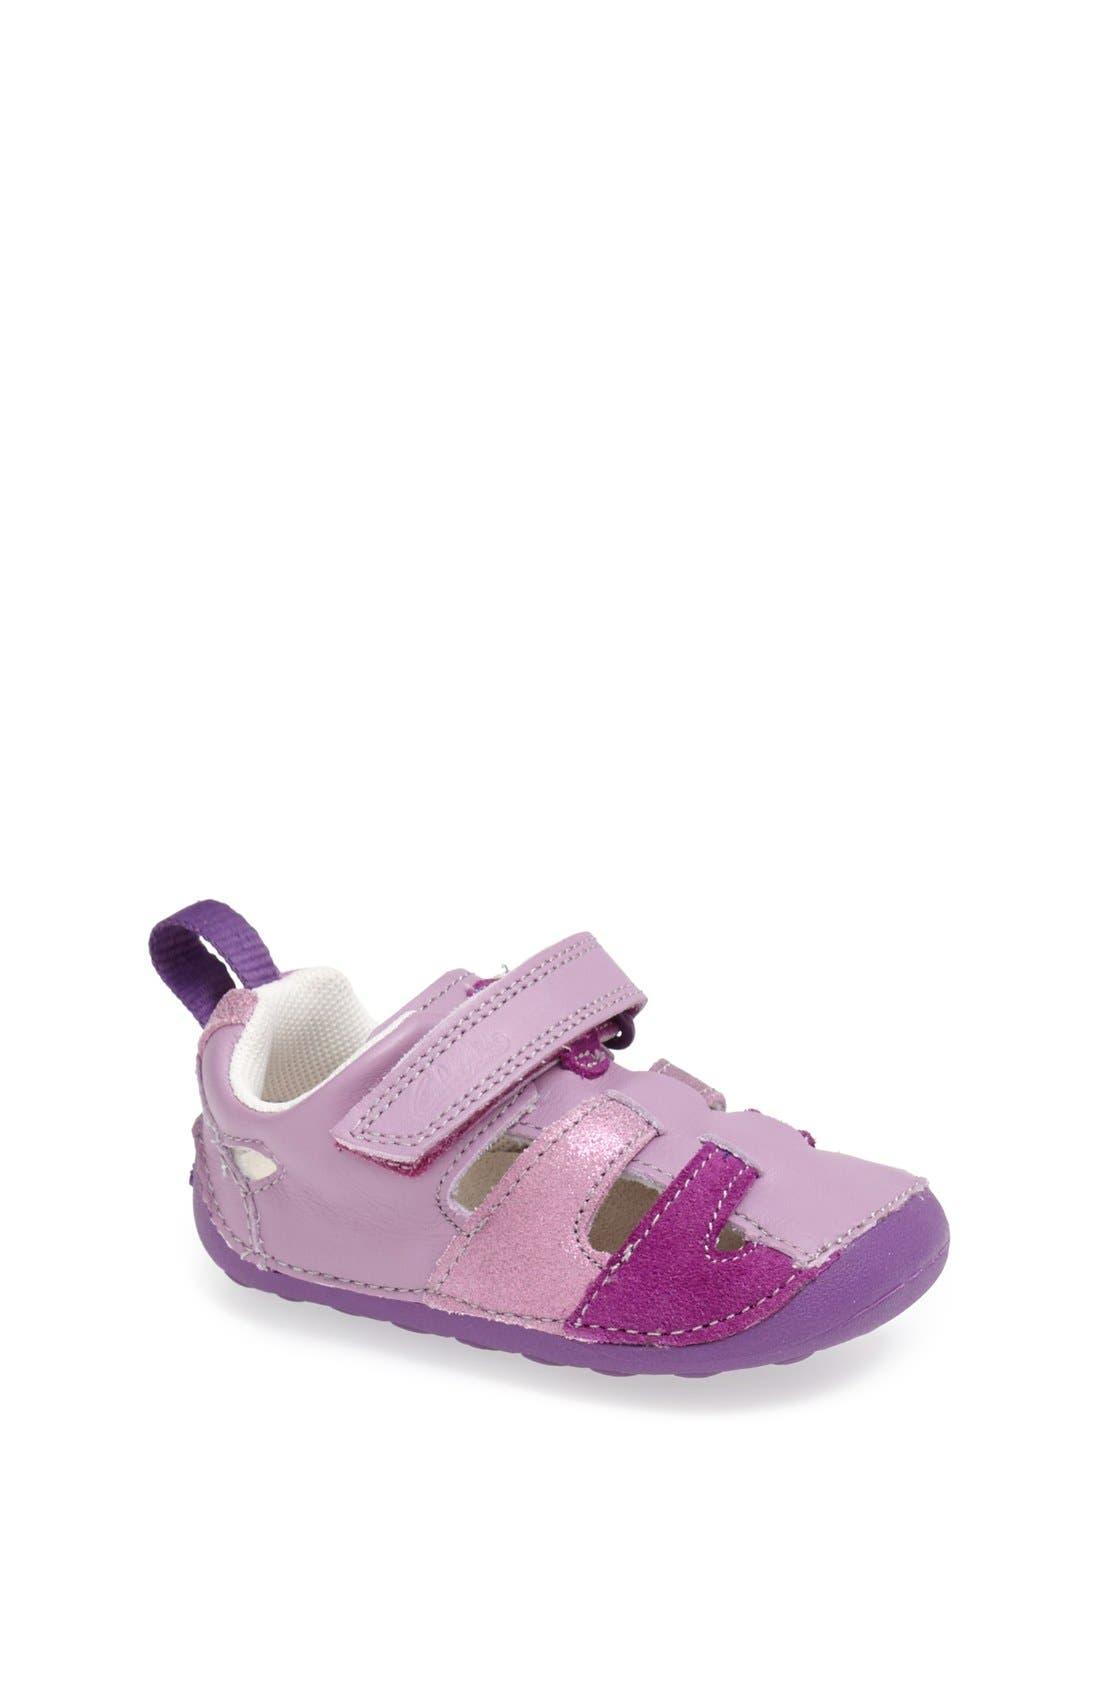 Alternate Image 1 Selected - Clarks® 'Tiny Girl' Leather Sandal (Baby & Walker)